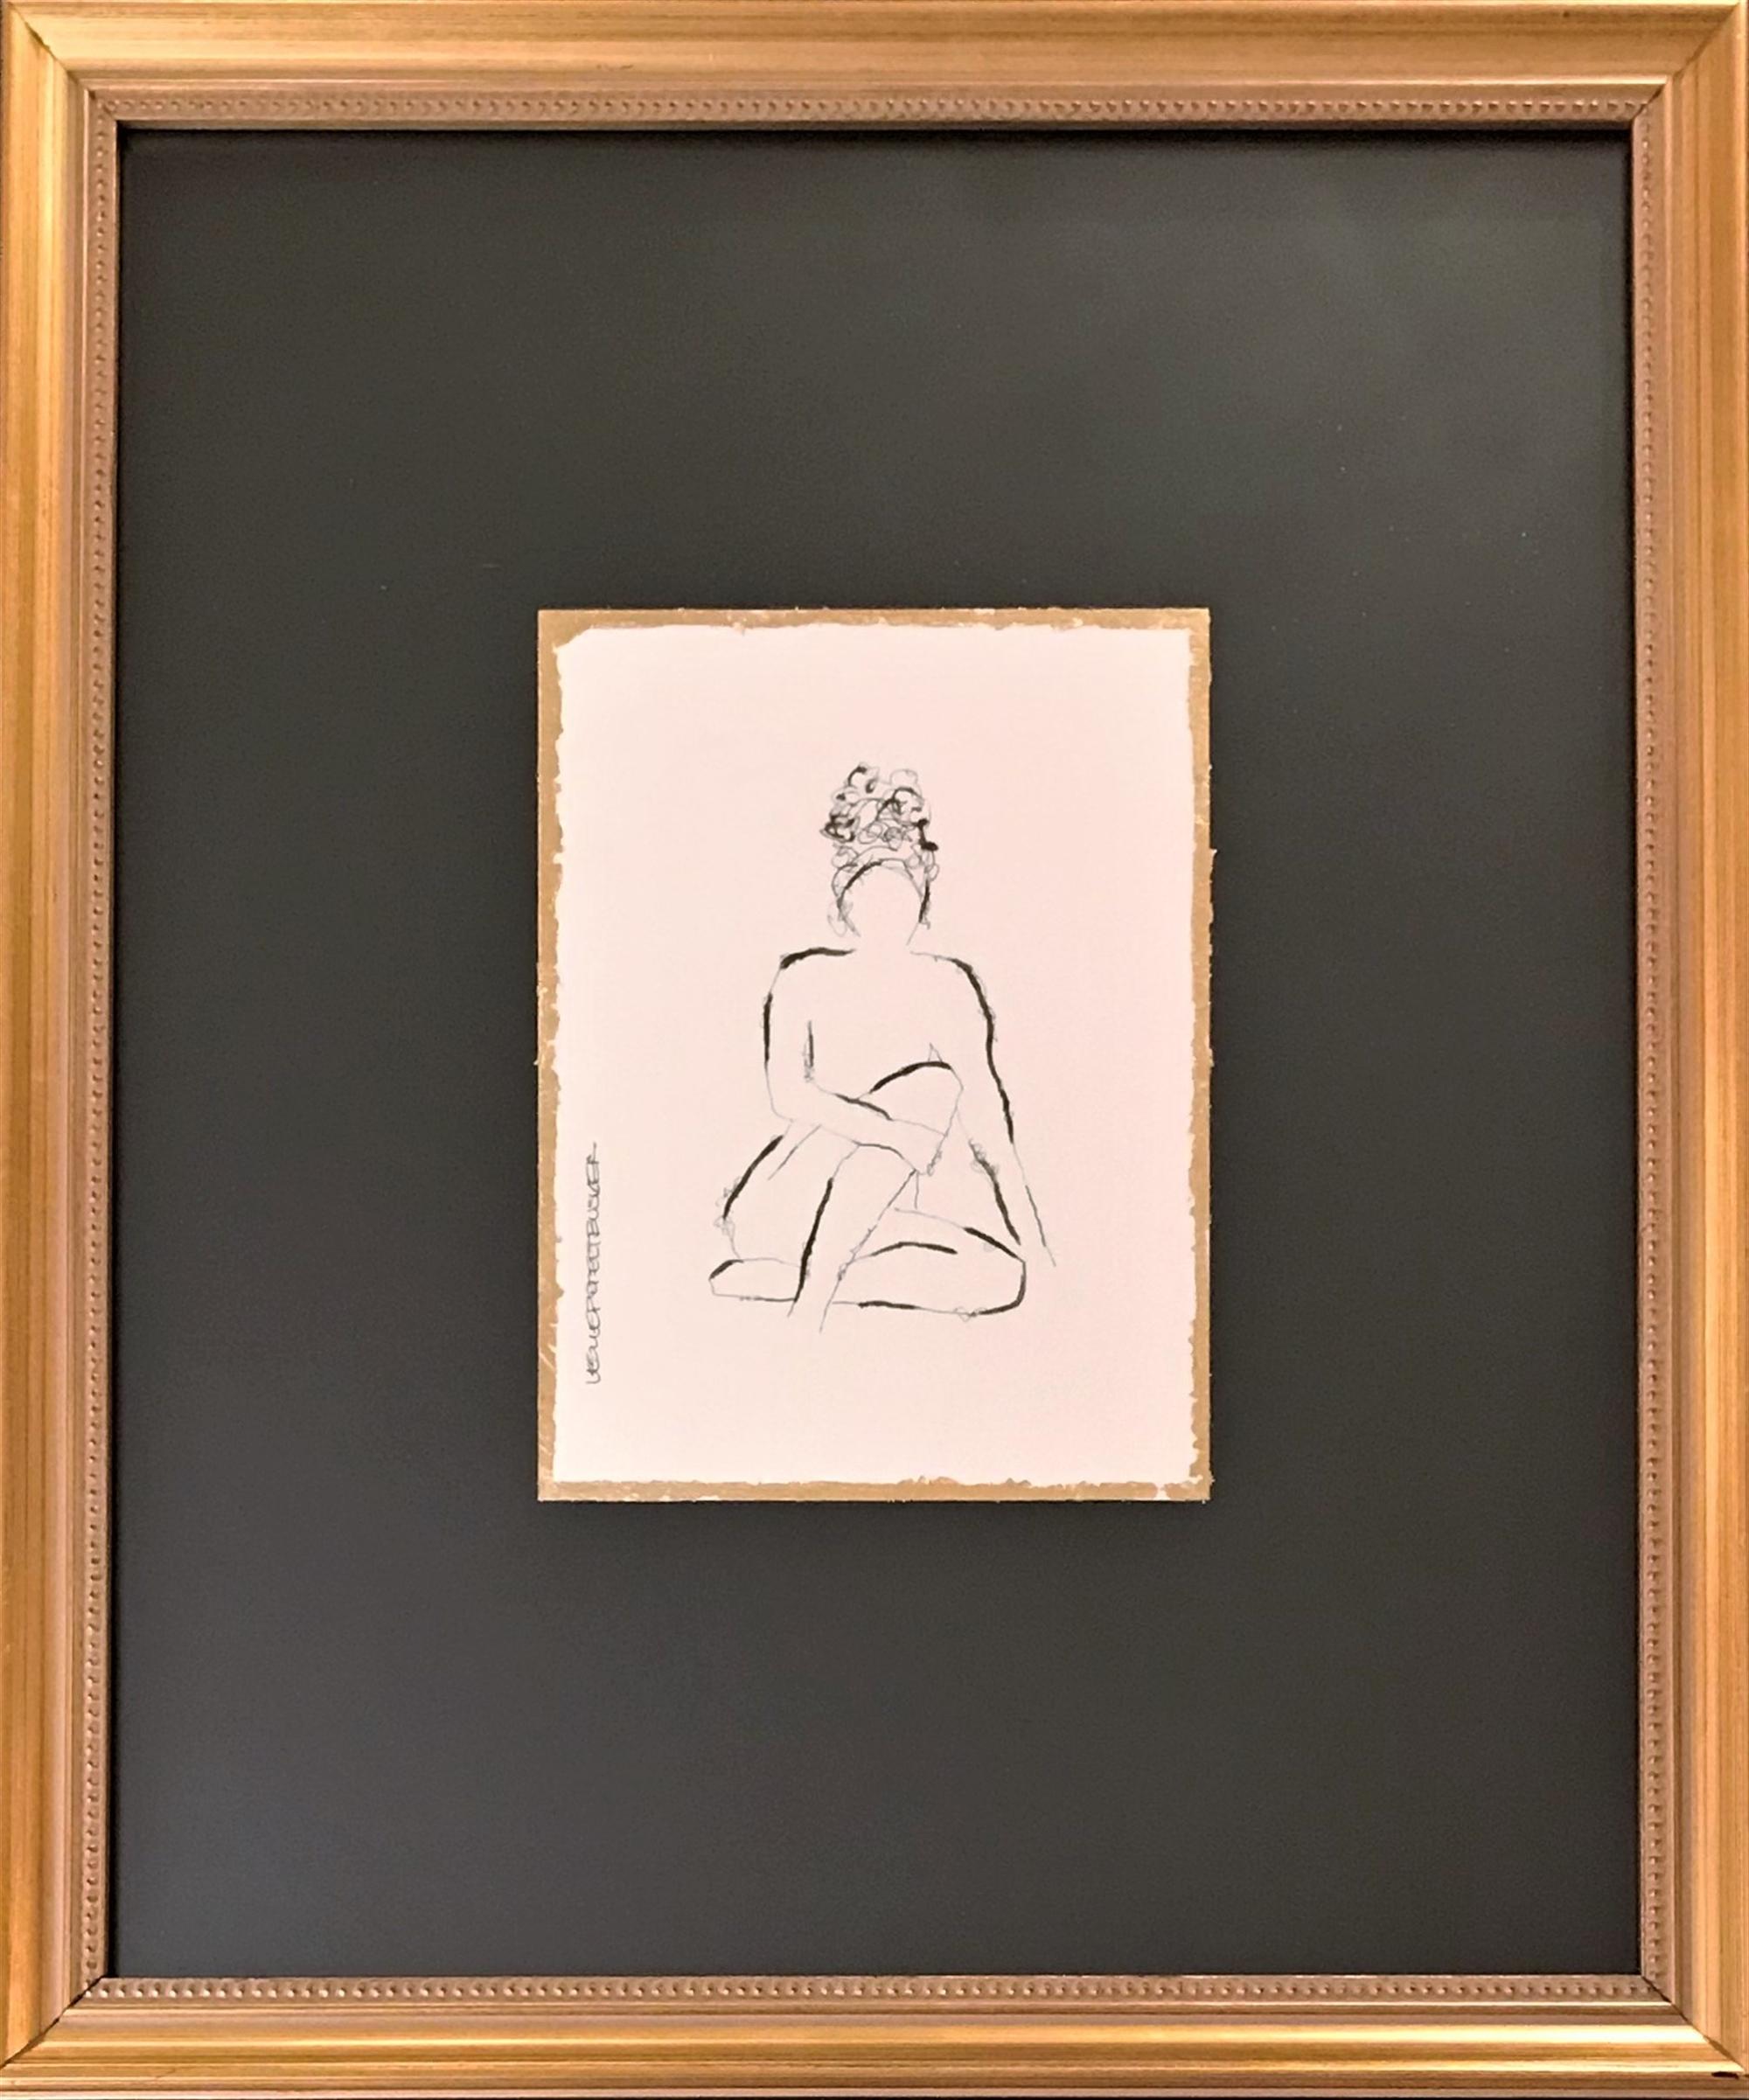 Figure No. 150 by Leslie Poteet Busker